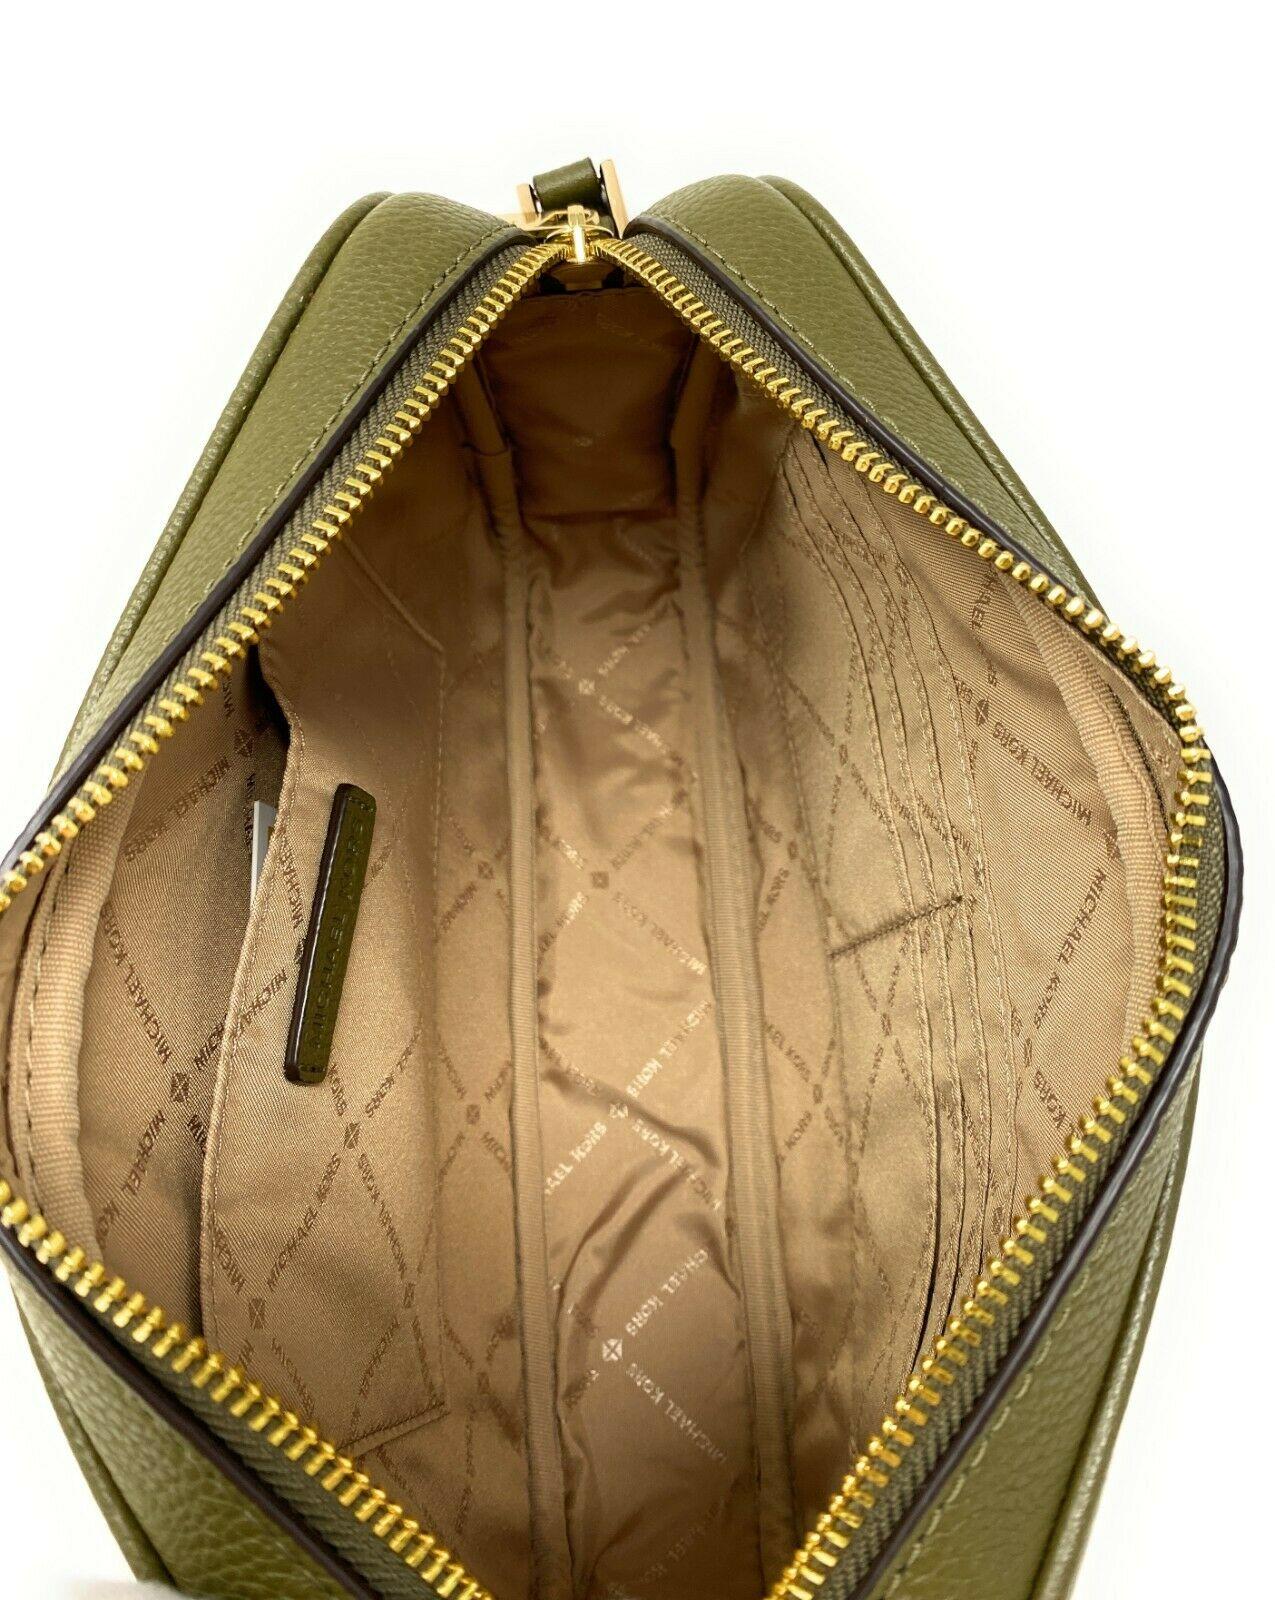 thumbnail 49 - Michael Kors Jet Set Item Large East West Crossbody Chain Handbag Clutch $298